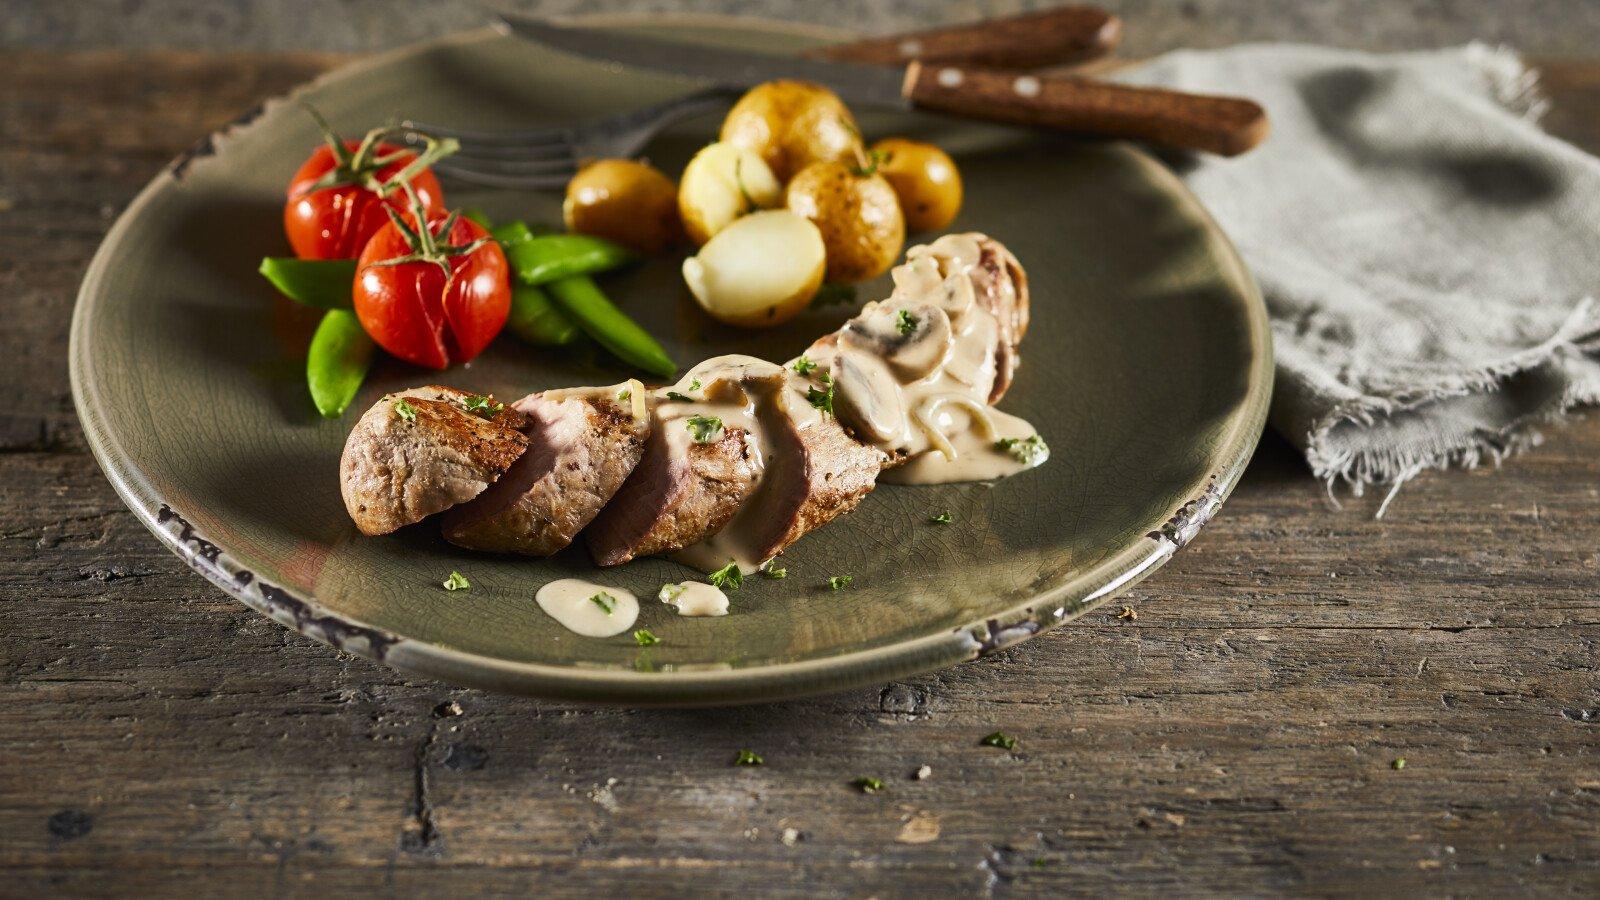 Gerecht, basissaus, C'est Ça, champignon, bord, vegan, plantaardig